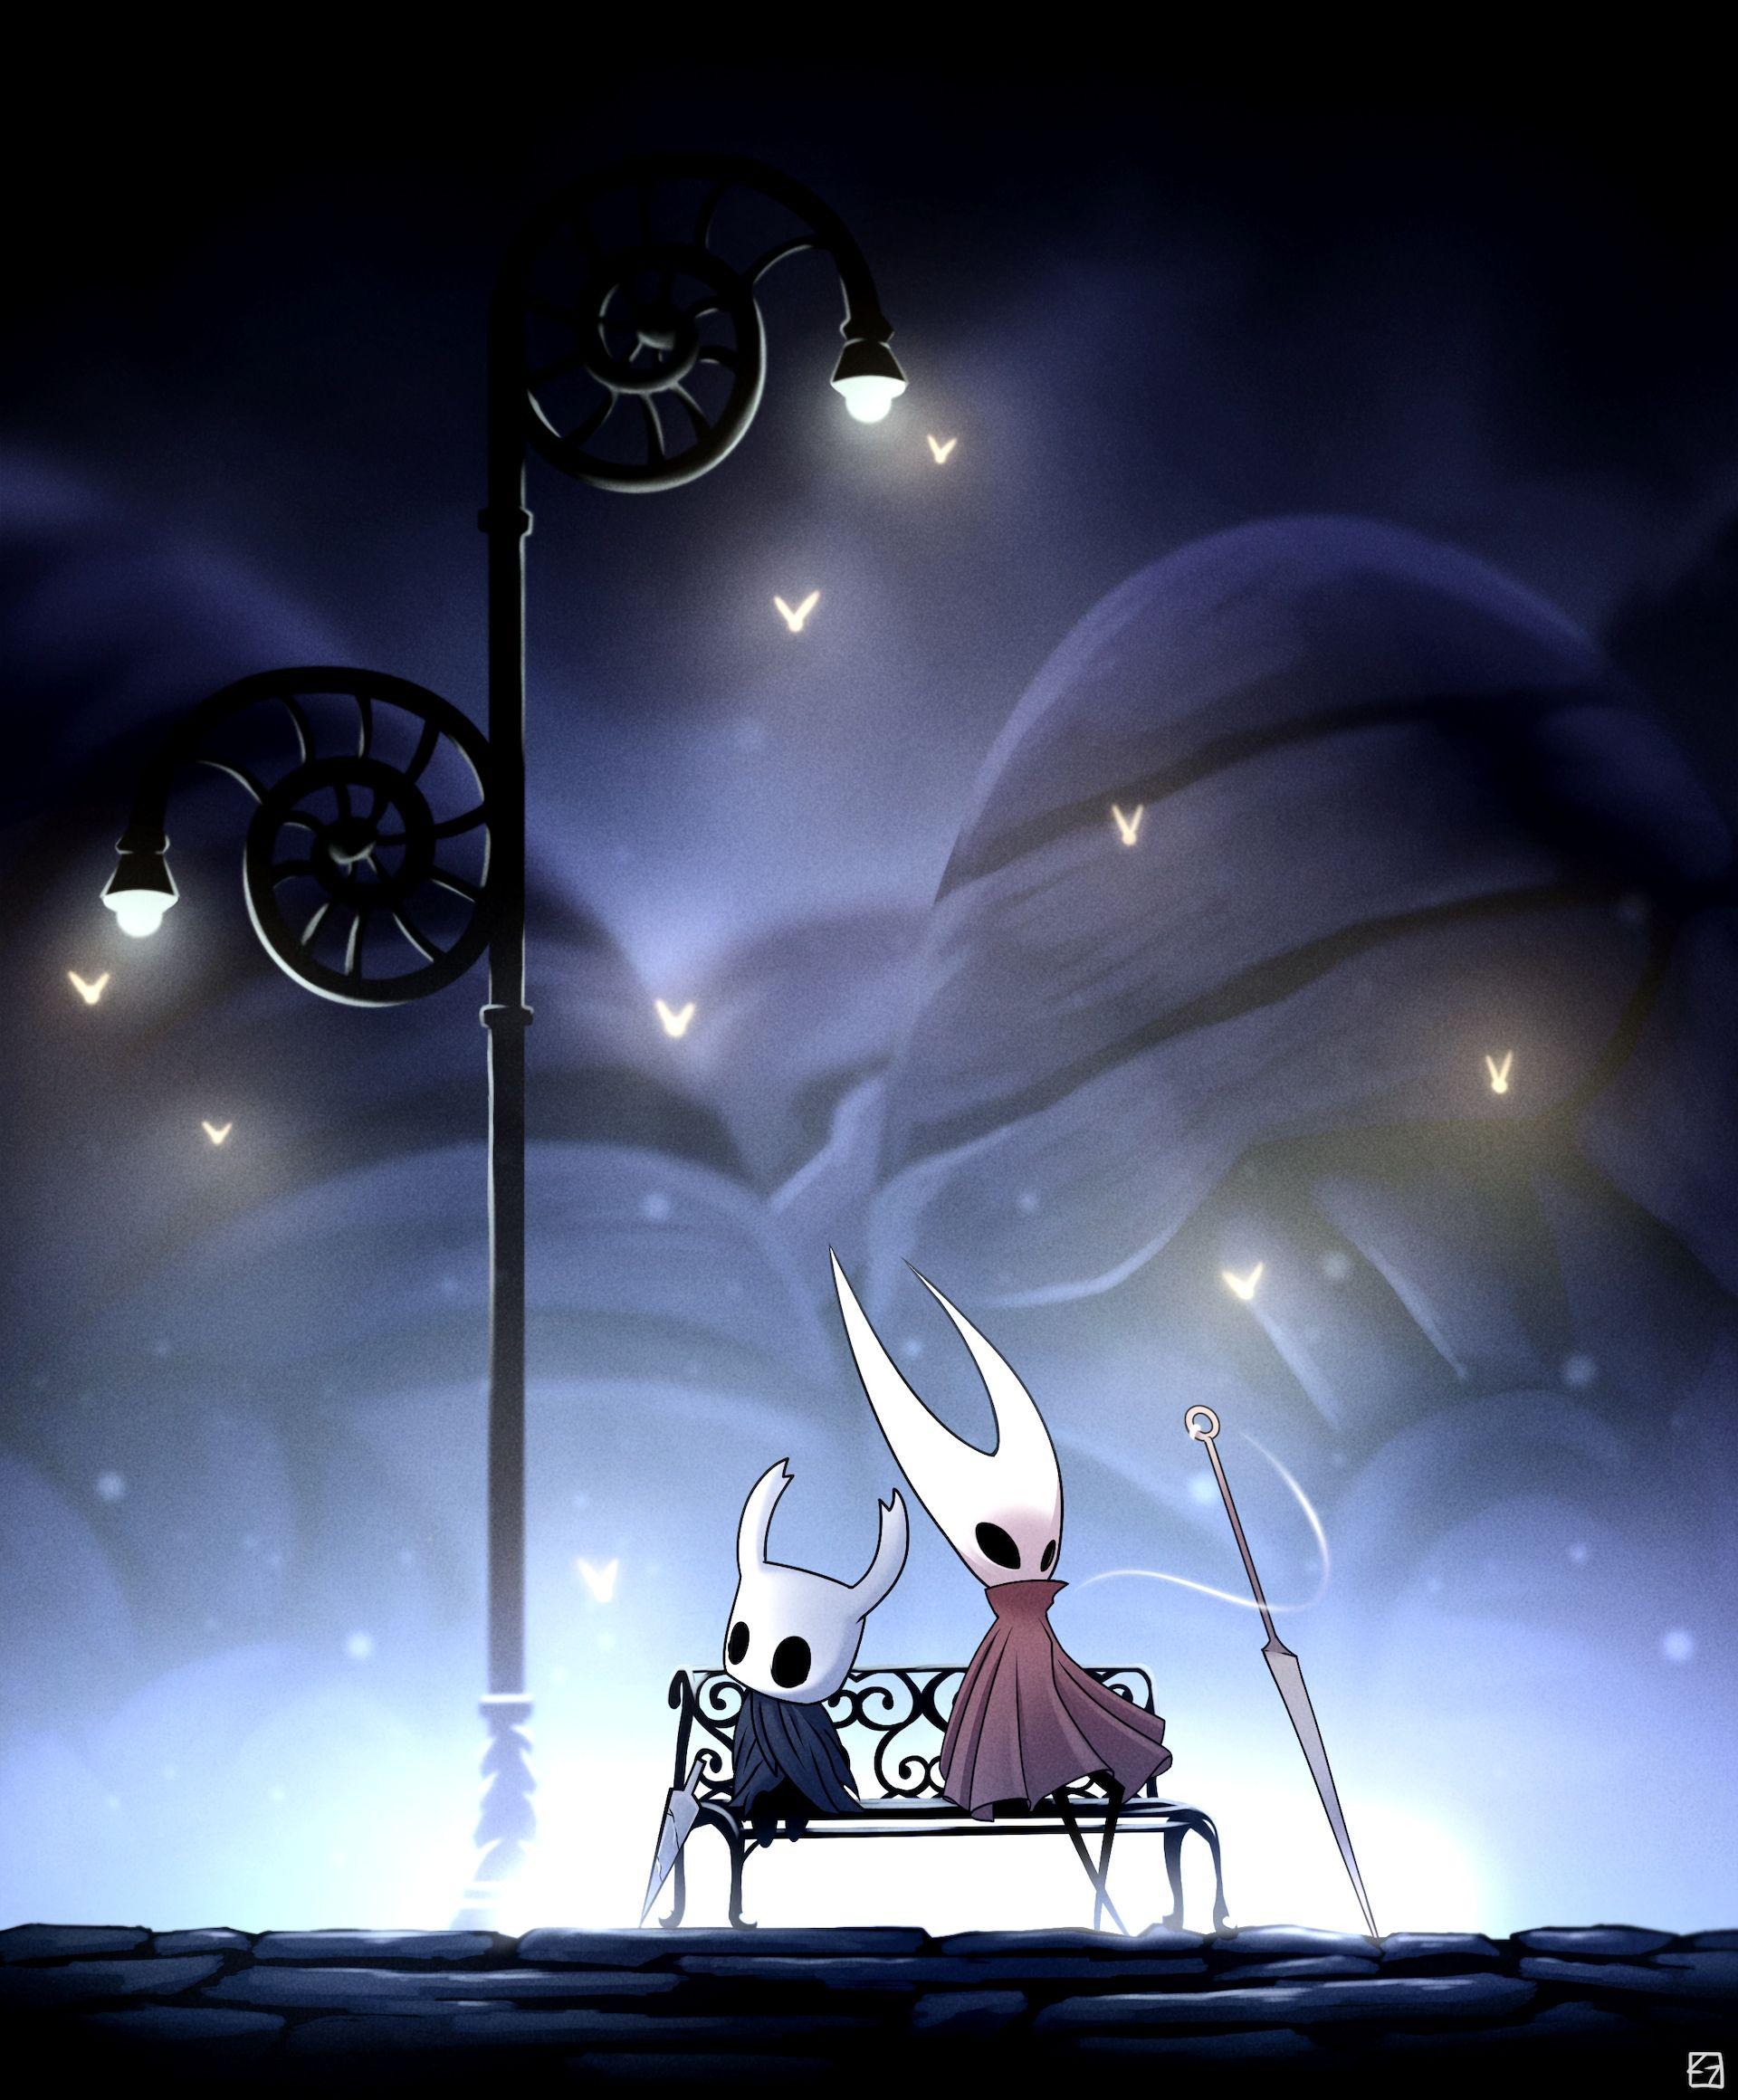 Comunidade Steam Hollow Knight Criaturas de fantasía